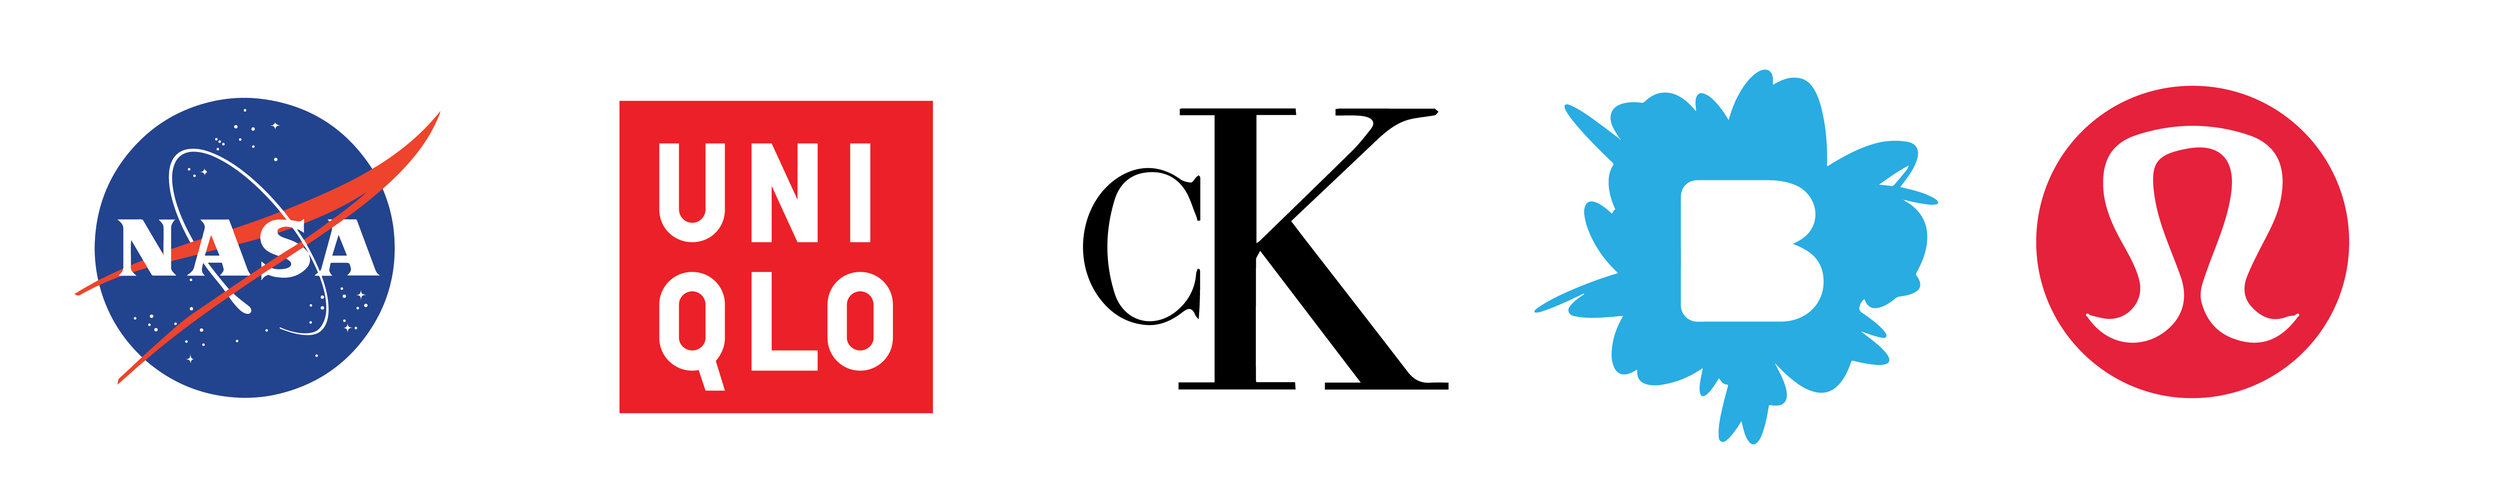 Web Logos-06.jpg